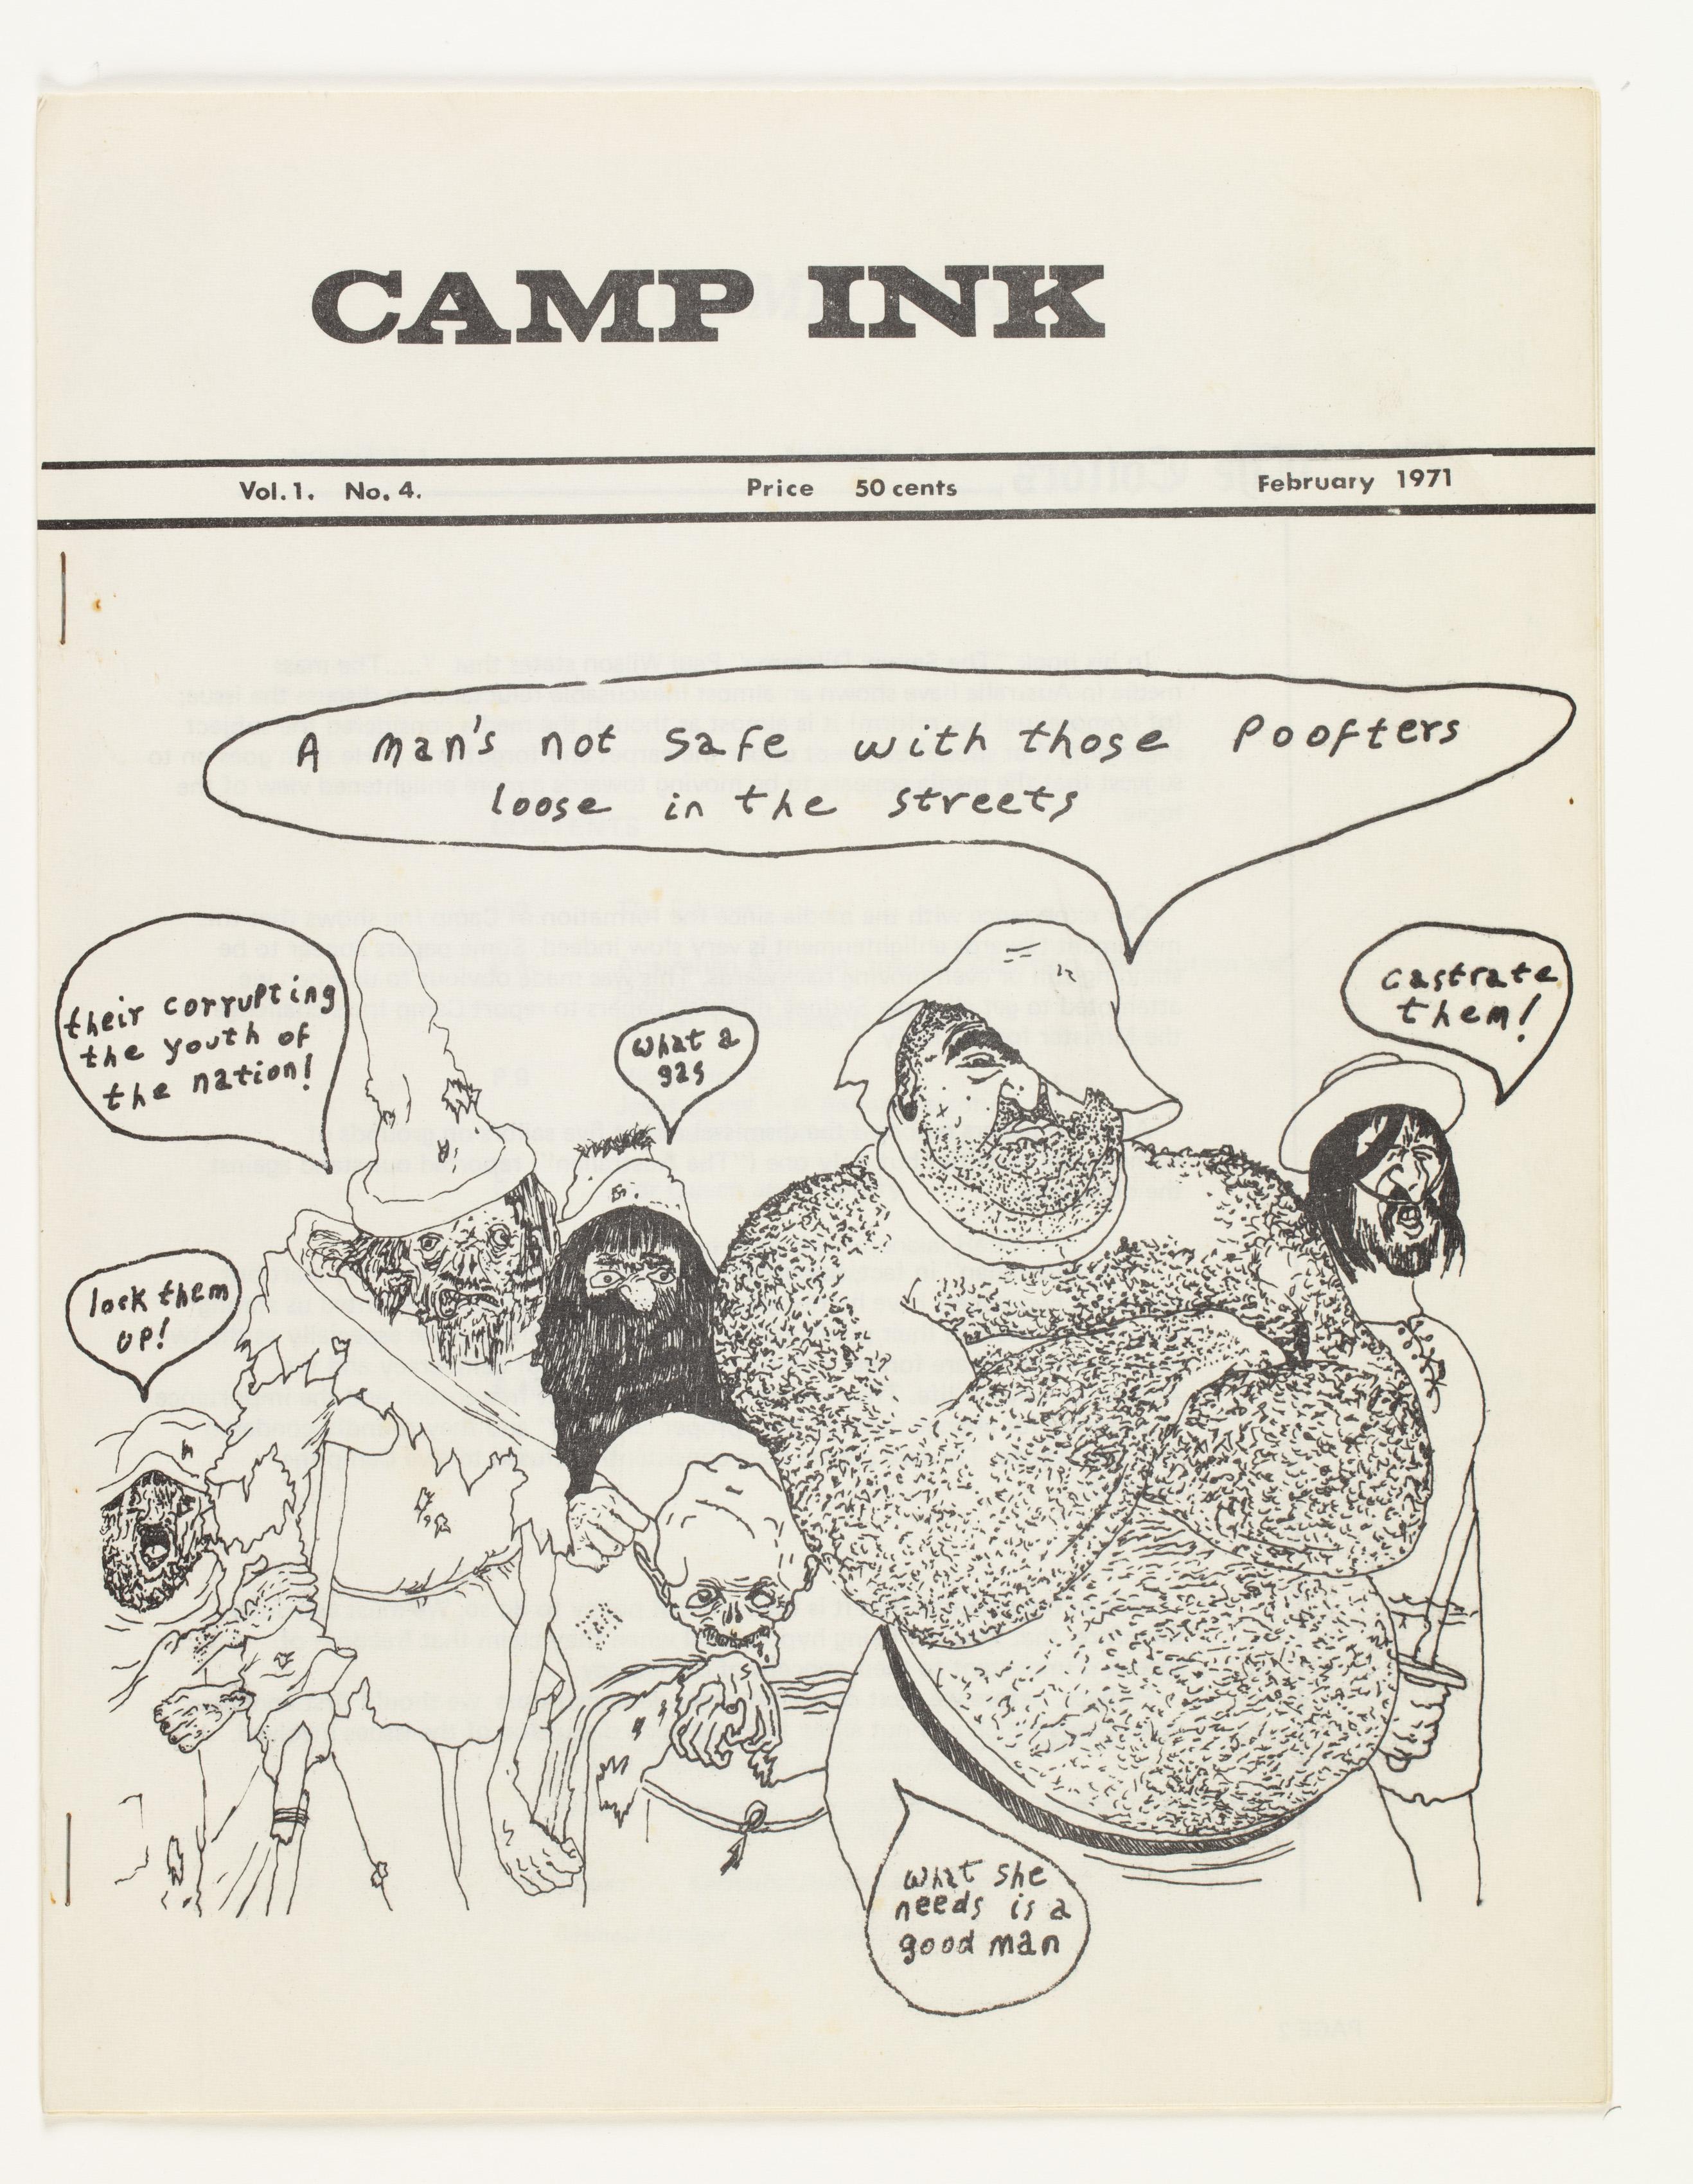 Camp Ink. Vol. 1, No.4 (February 1971)